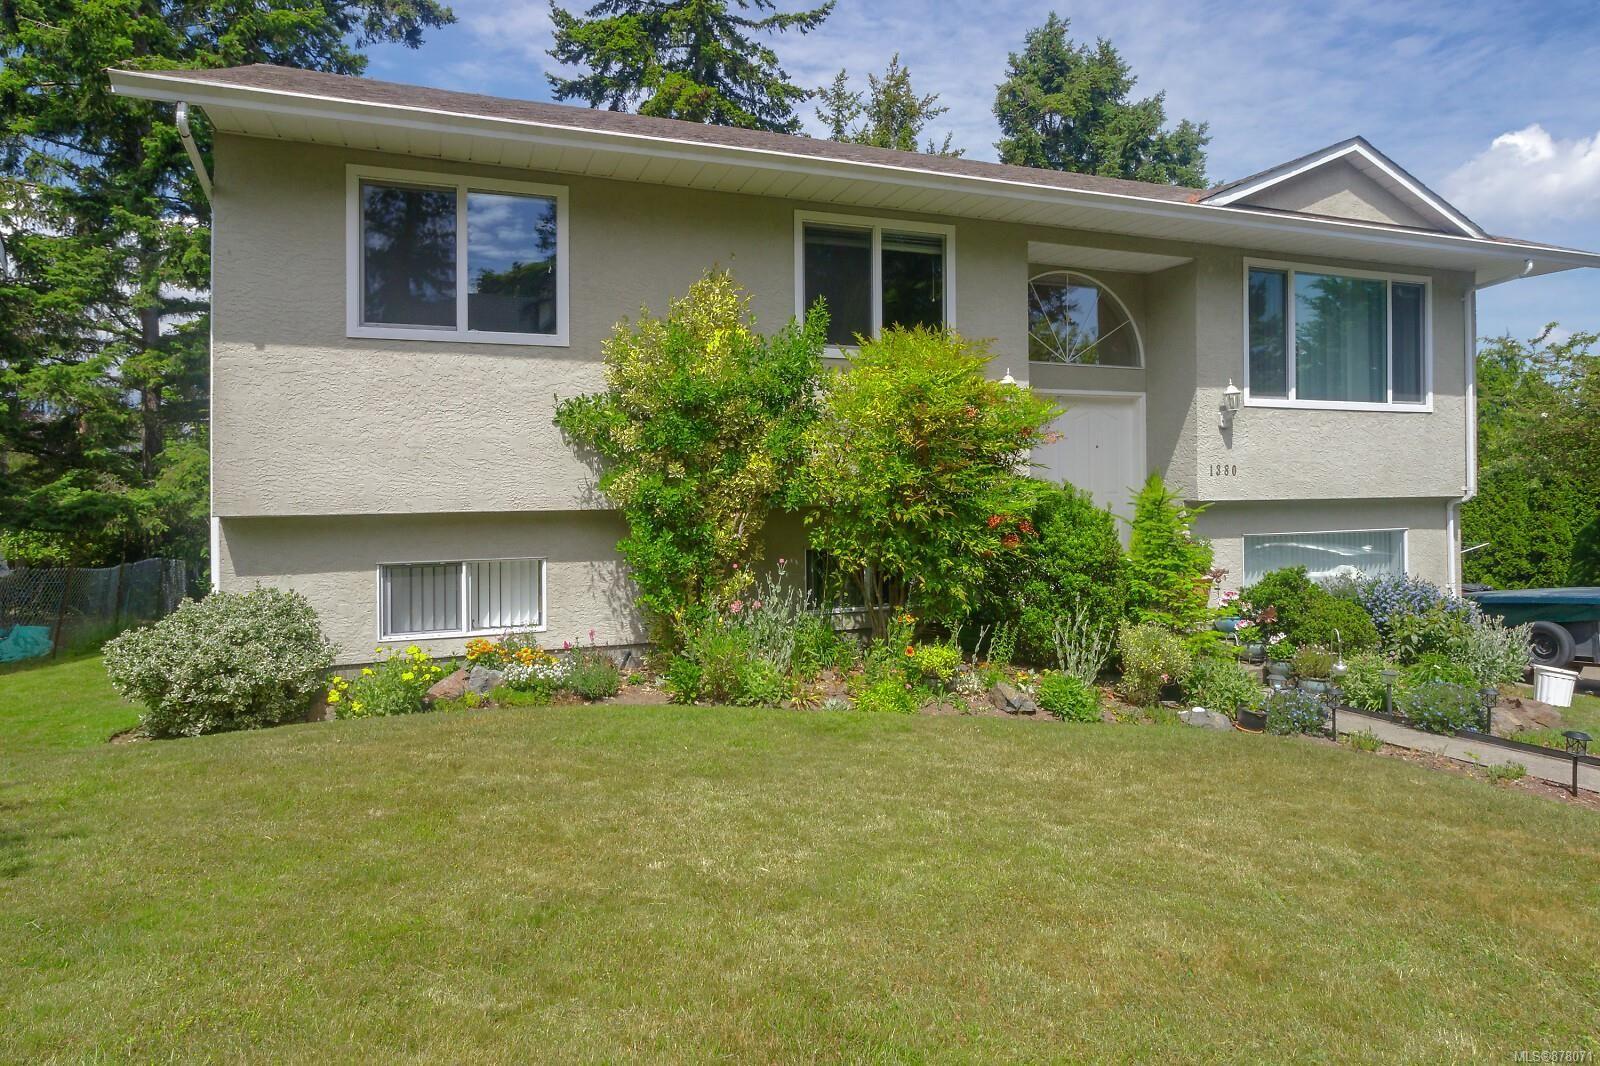 Main Photo: 1380 W Treebank Rd in : Es Kinsmen Park House for sale (Esquimalt)  : MLS®# 878071